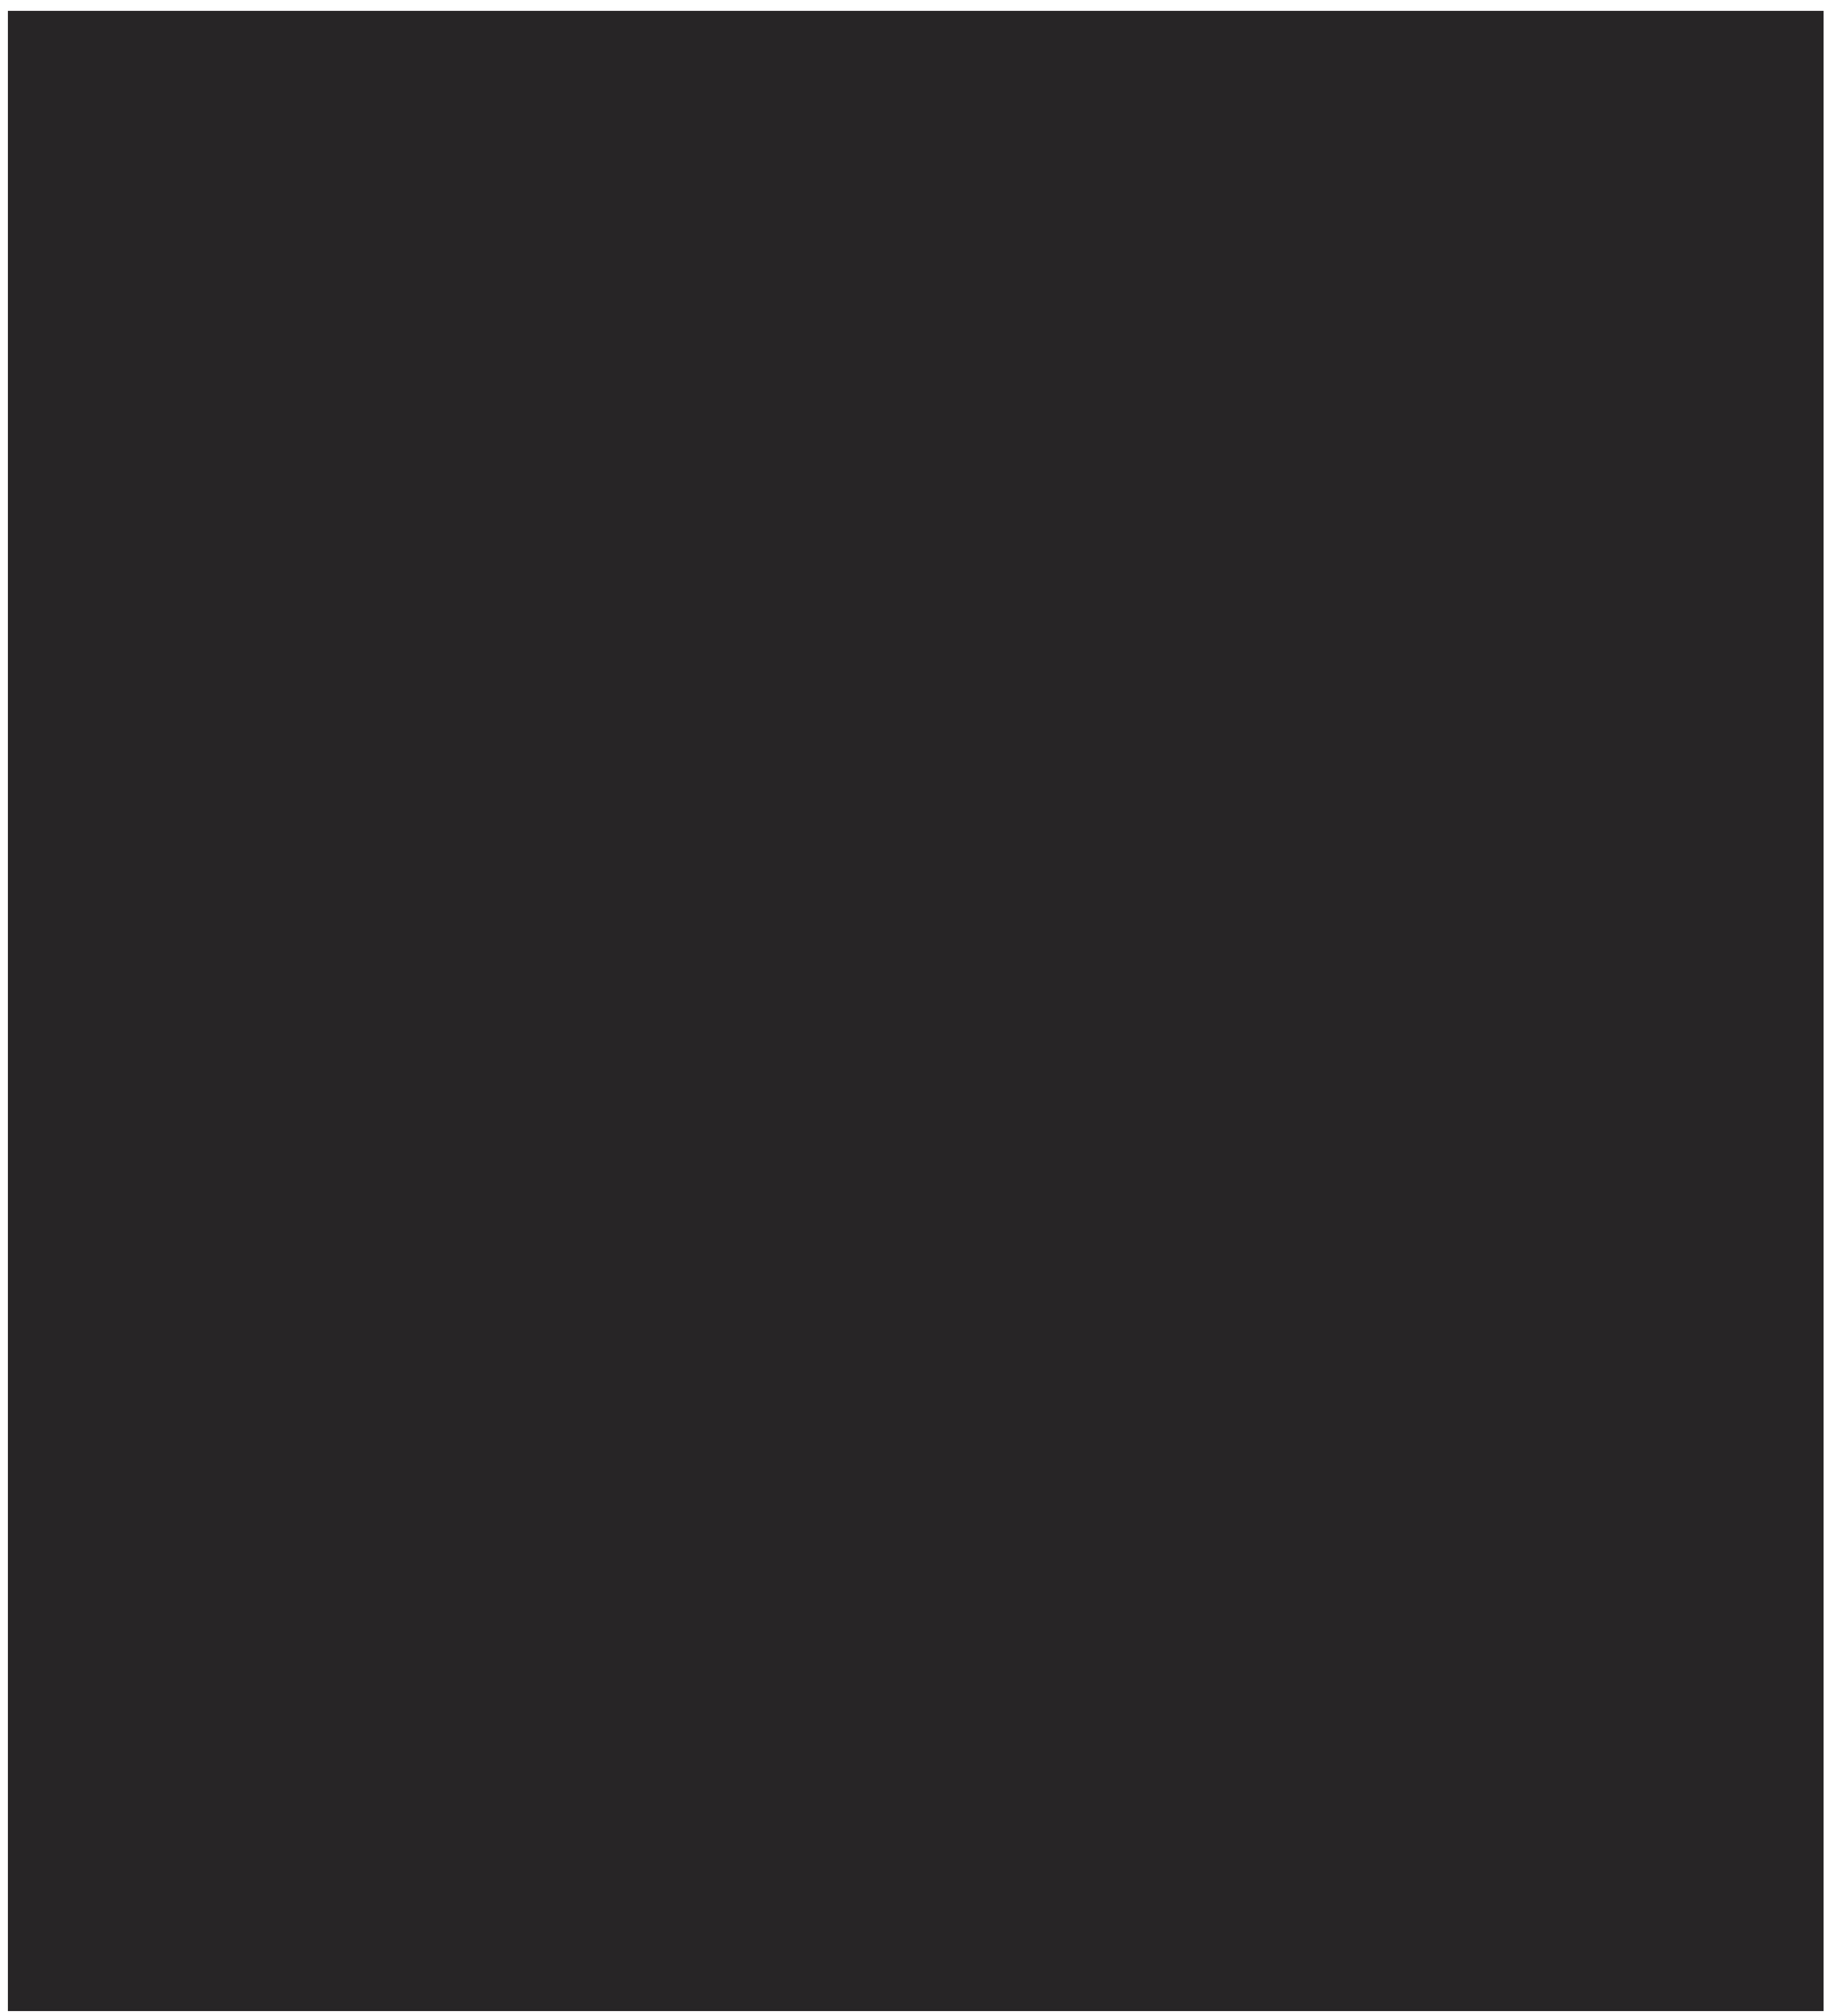 LaunchLab - Investor Deck